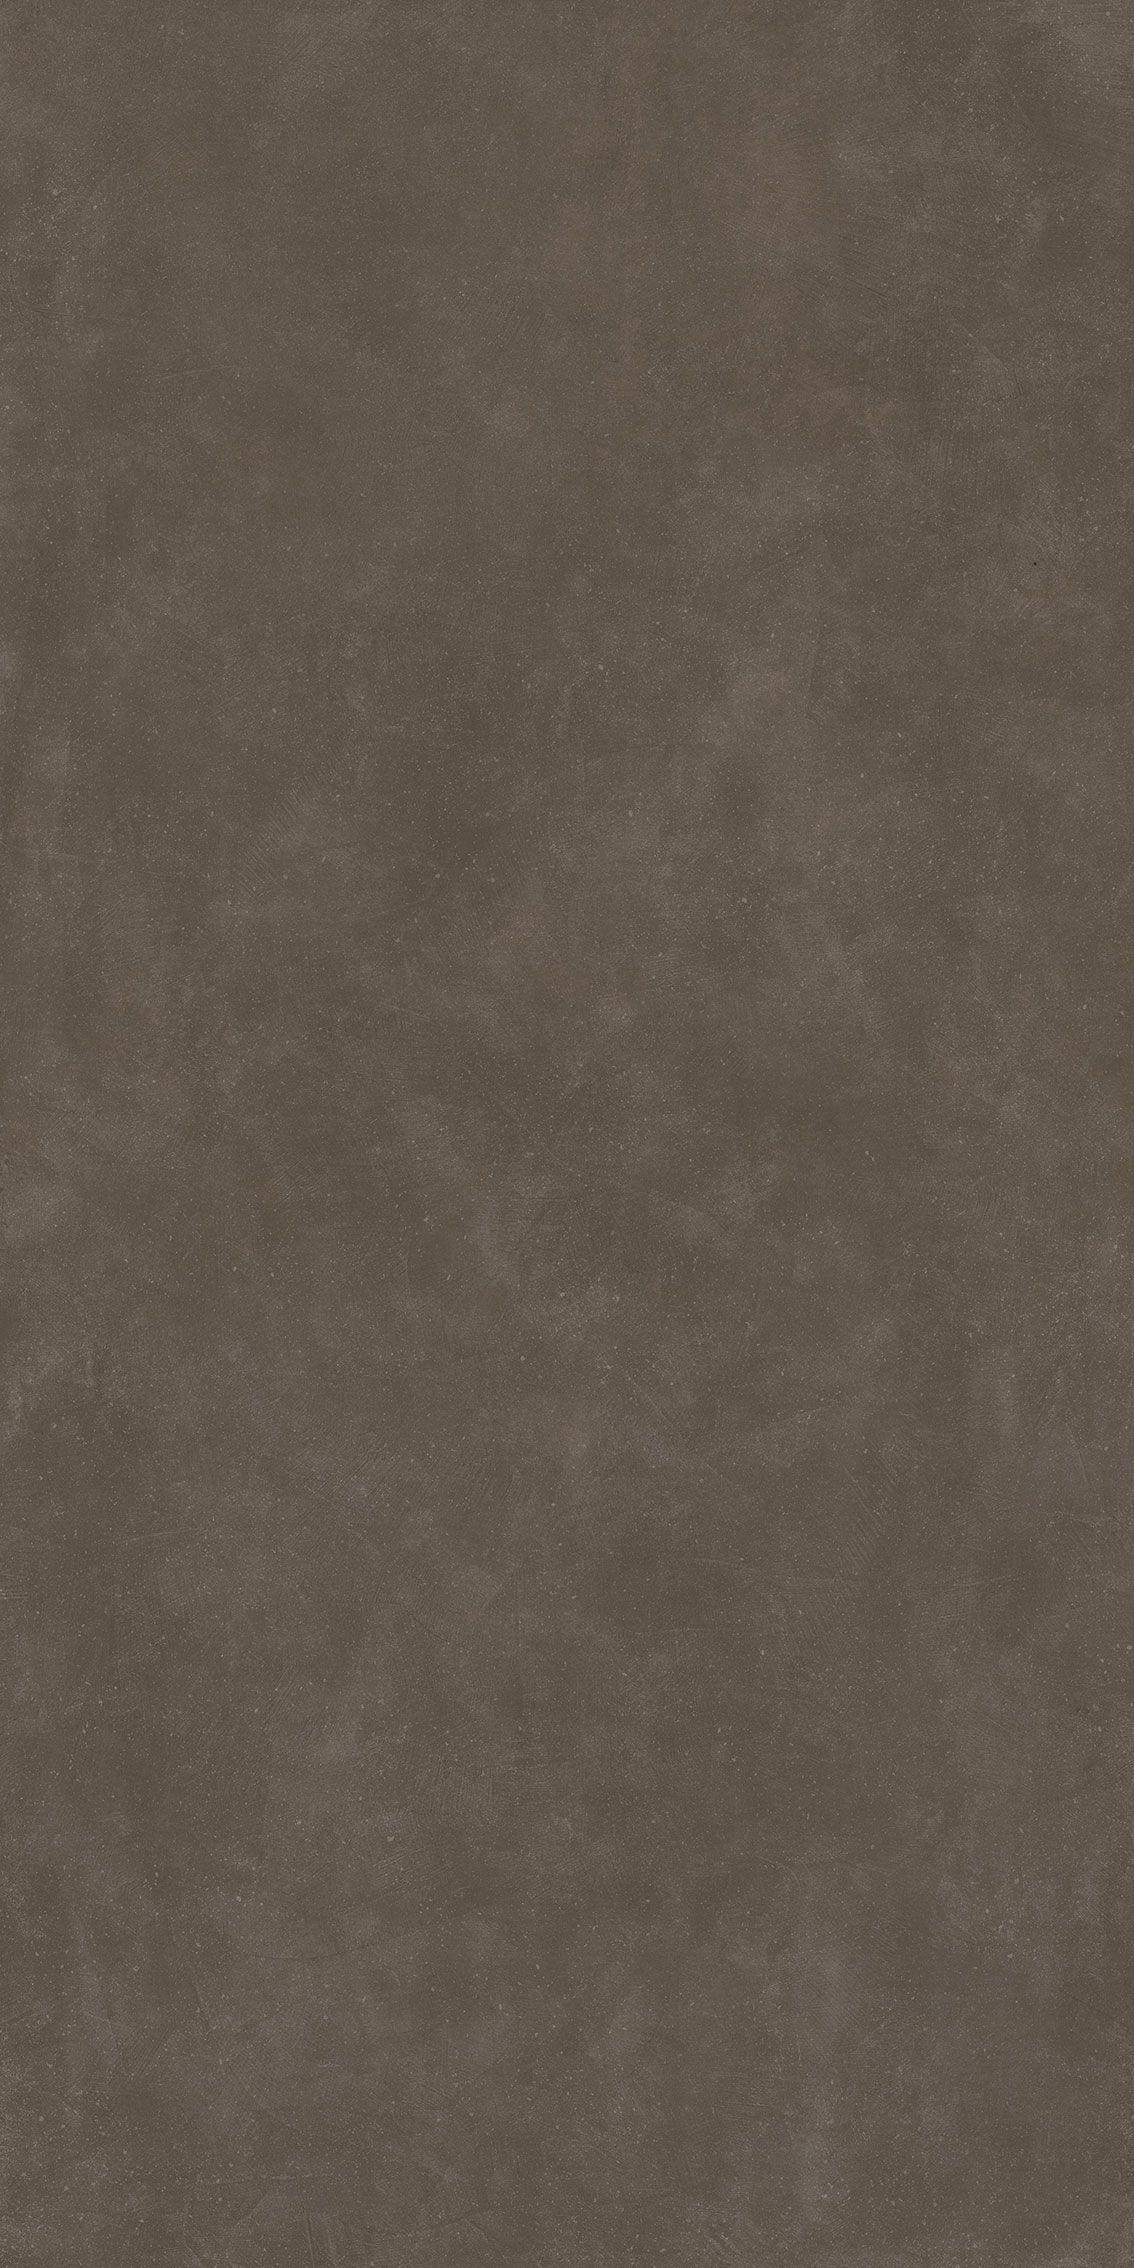 Texture Carrelage Moderne Nouveau Photos Industrial Moka 2 1134—2268 Italyarchitecture